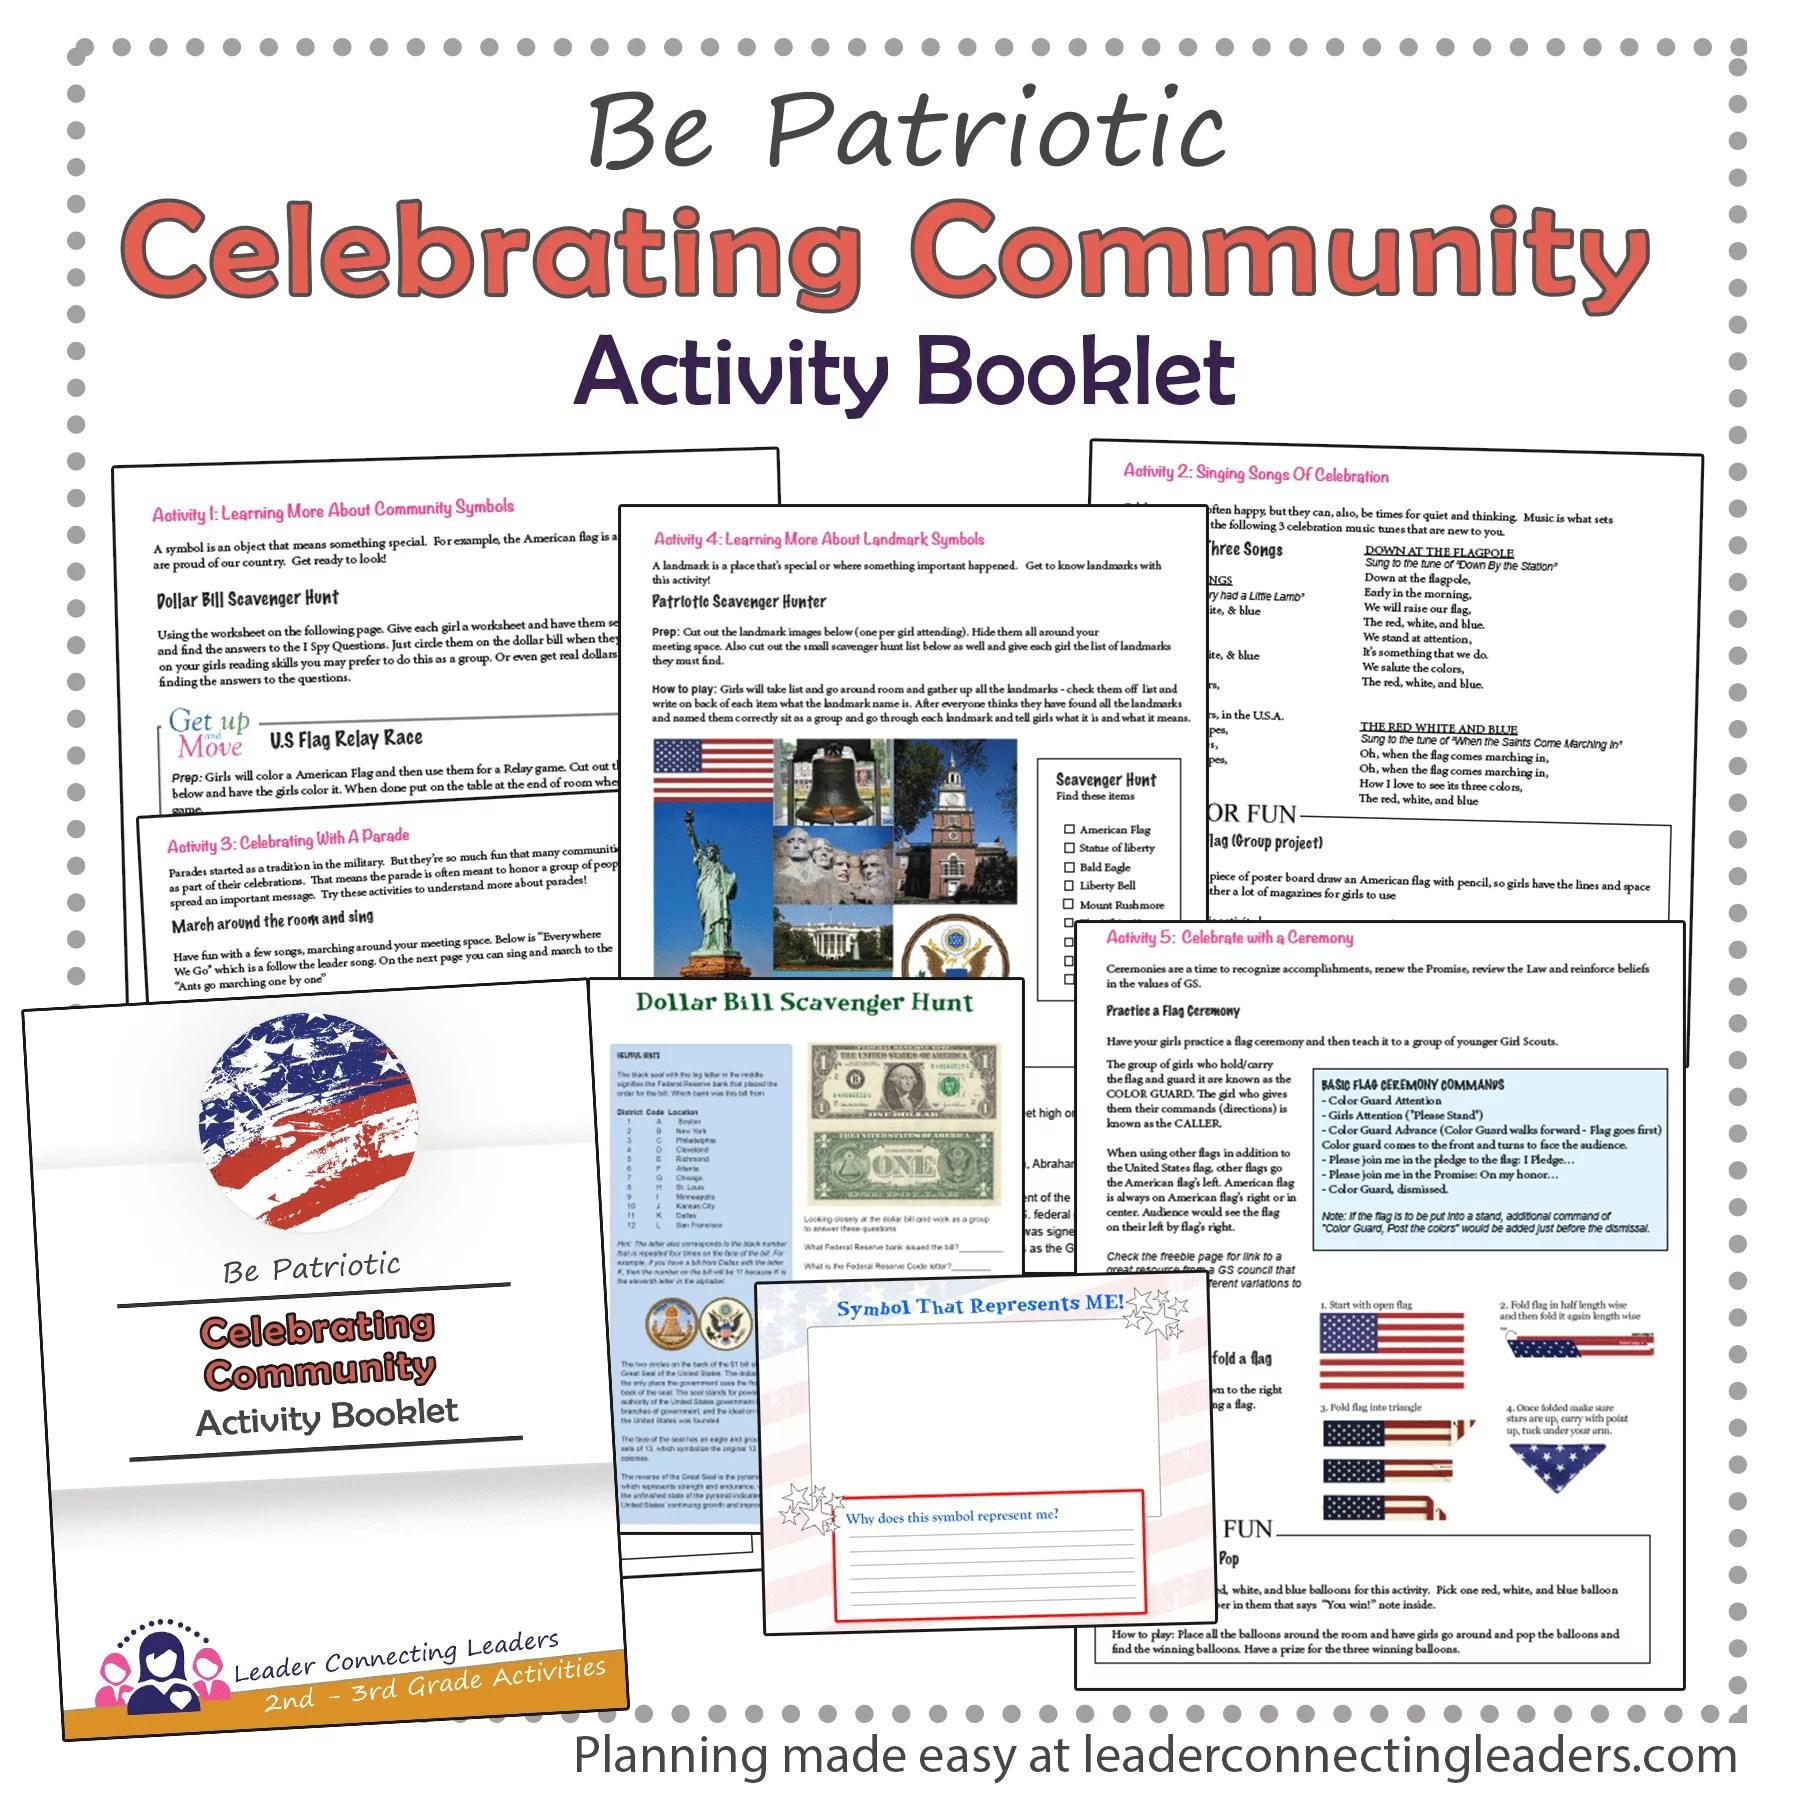 Celebrating Community Activity Booklet